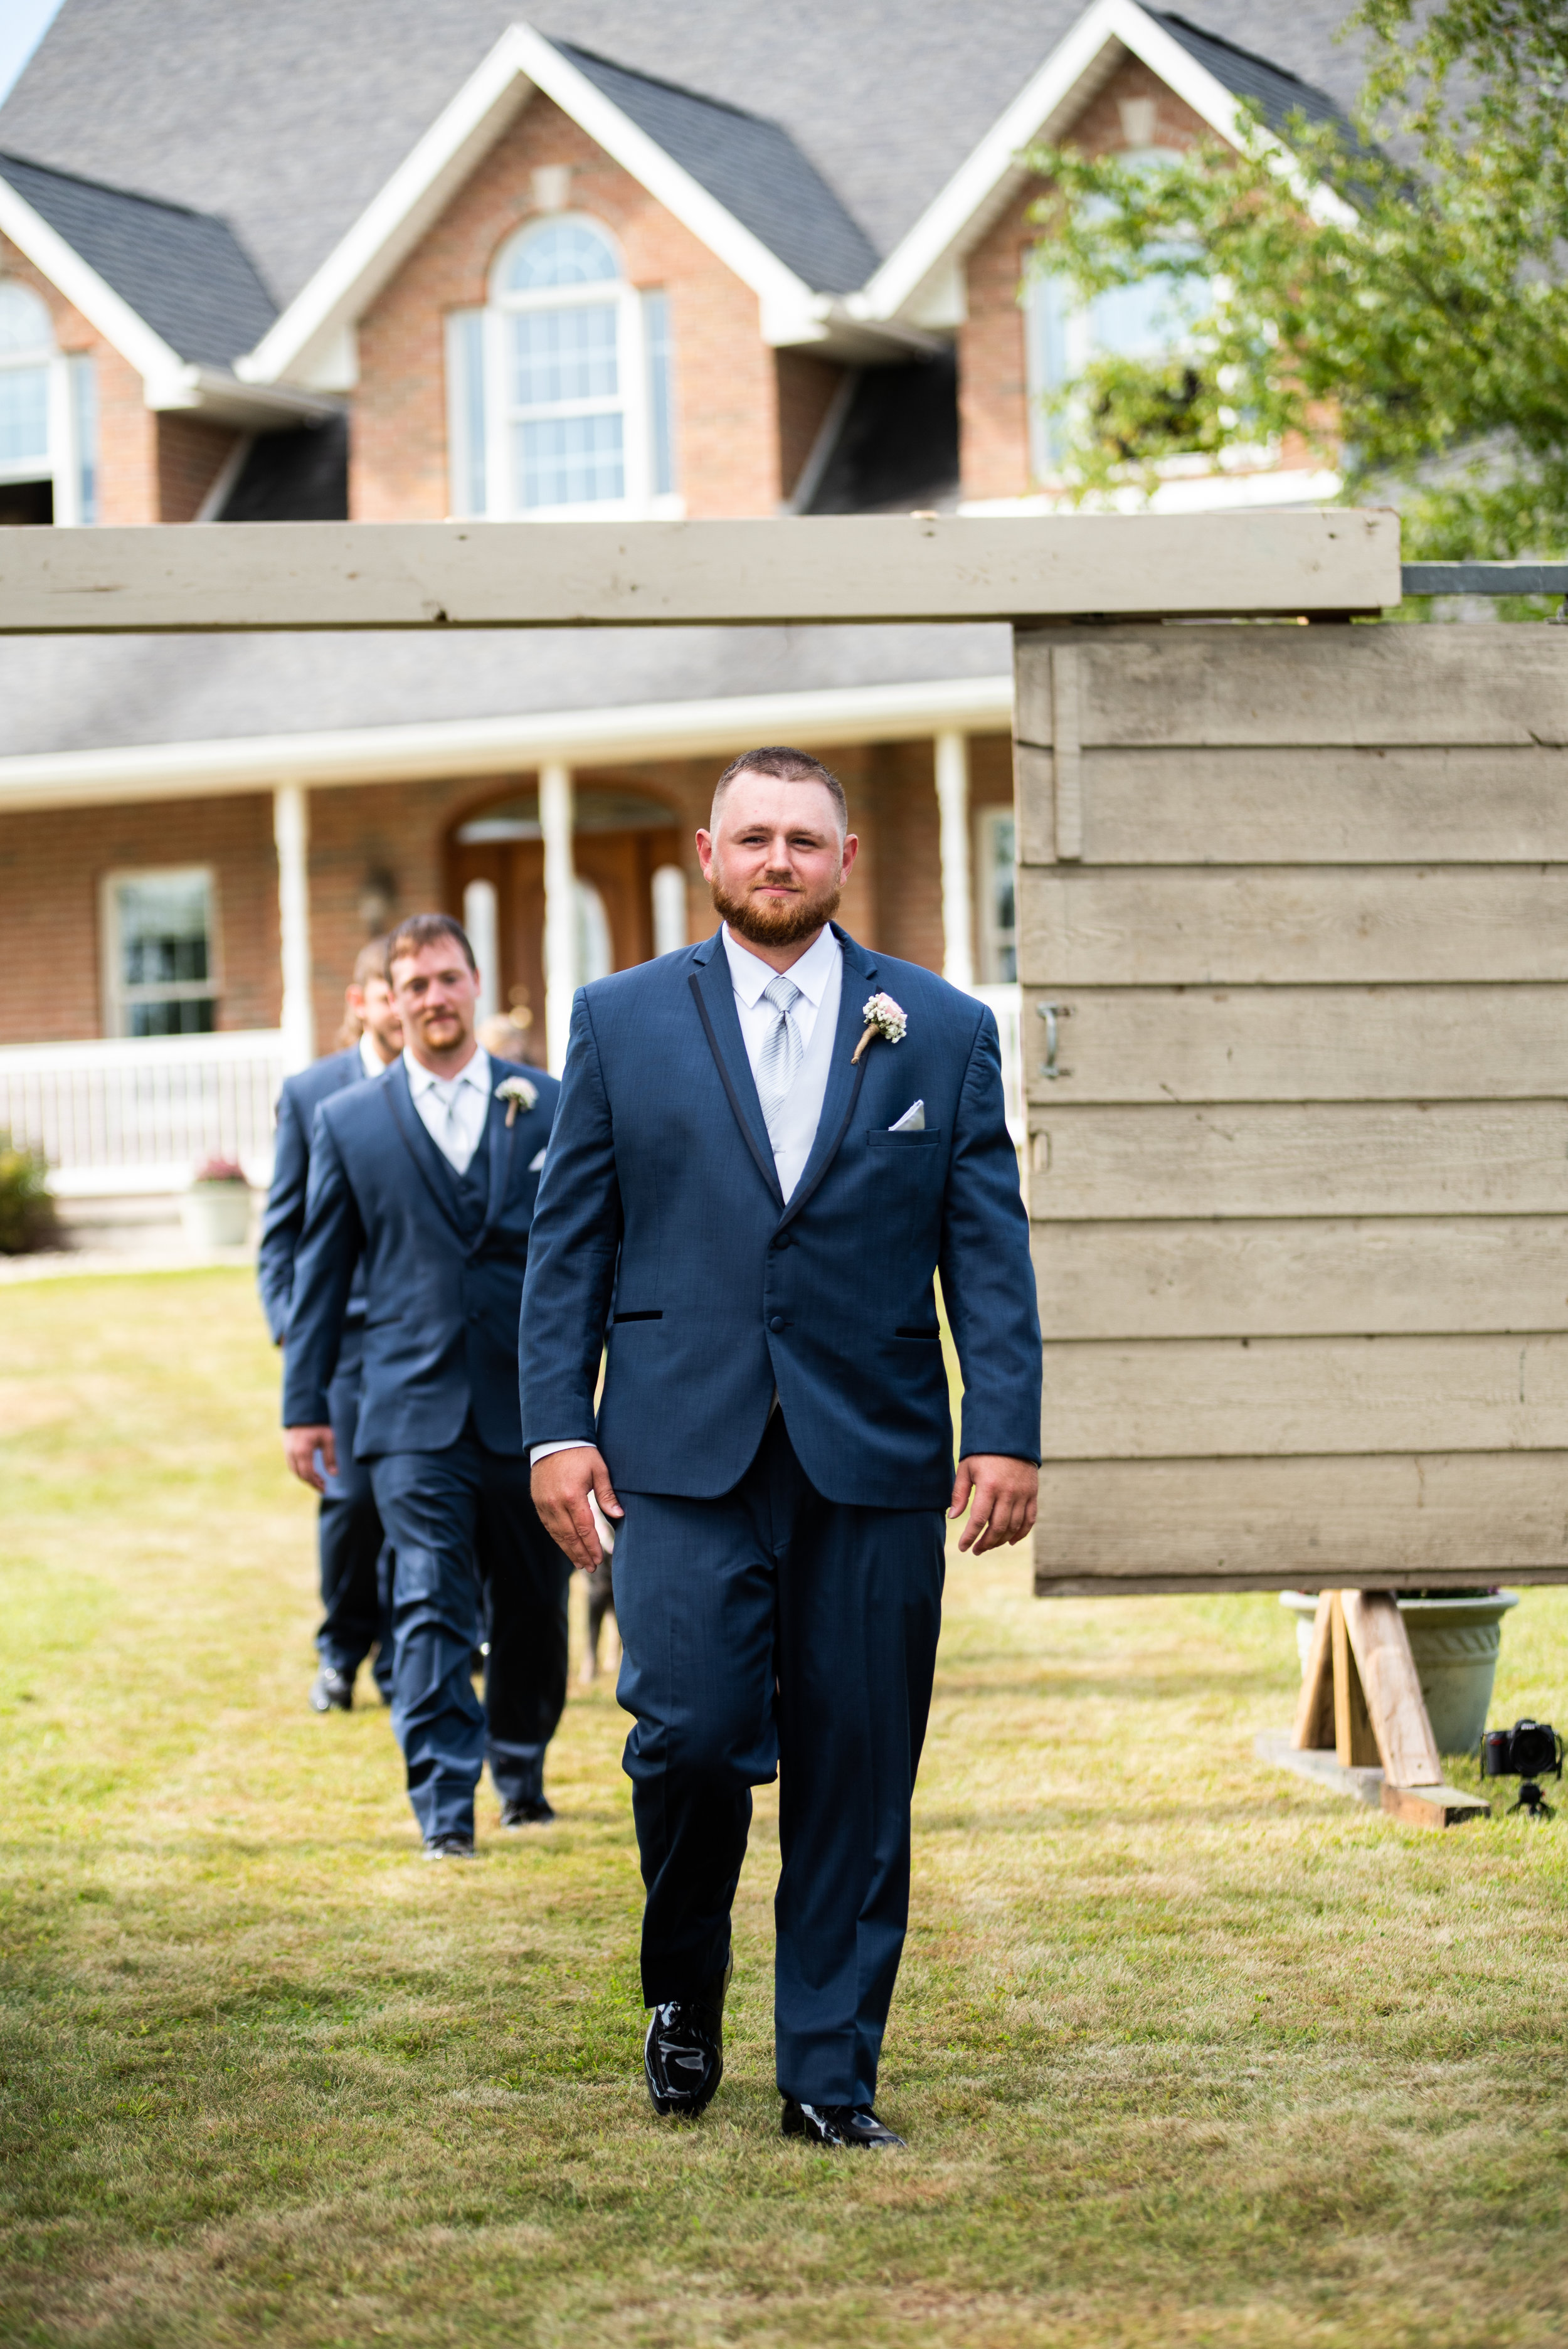 wedding (1 of 1)-70.jpg